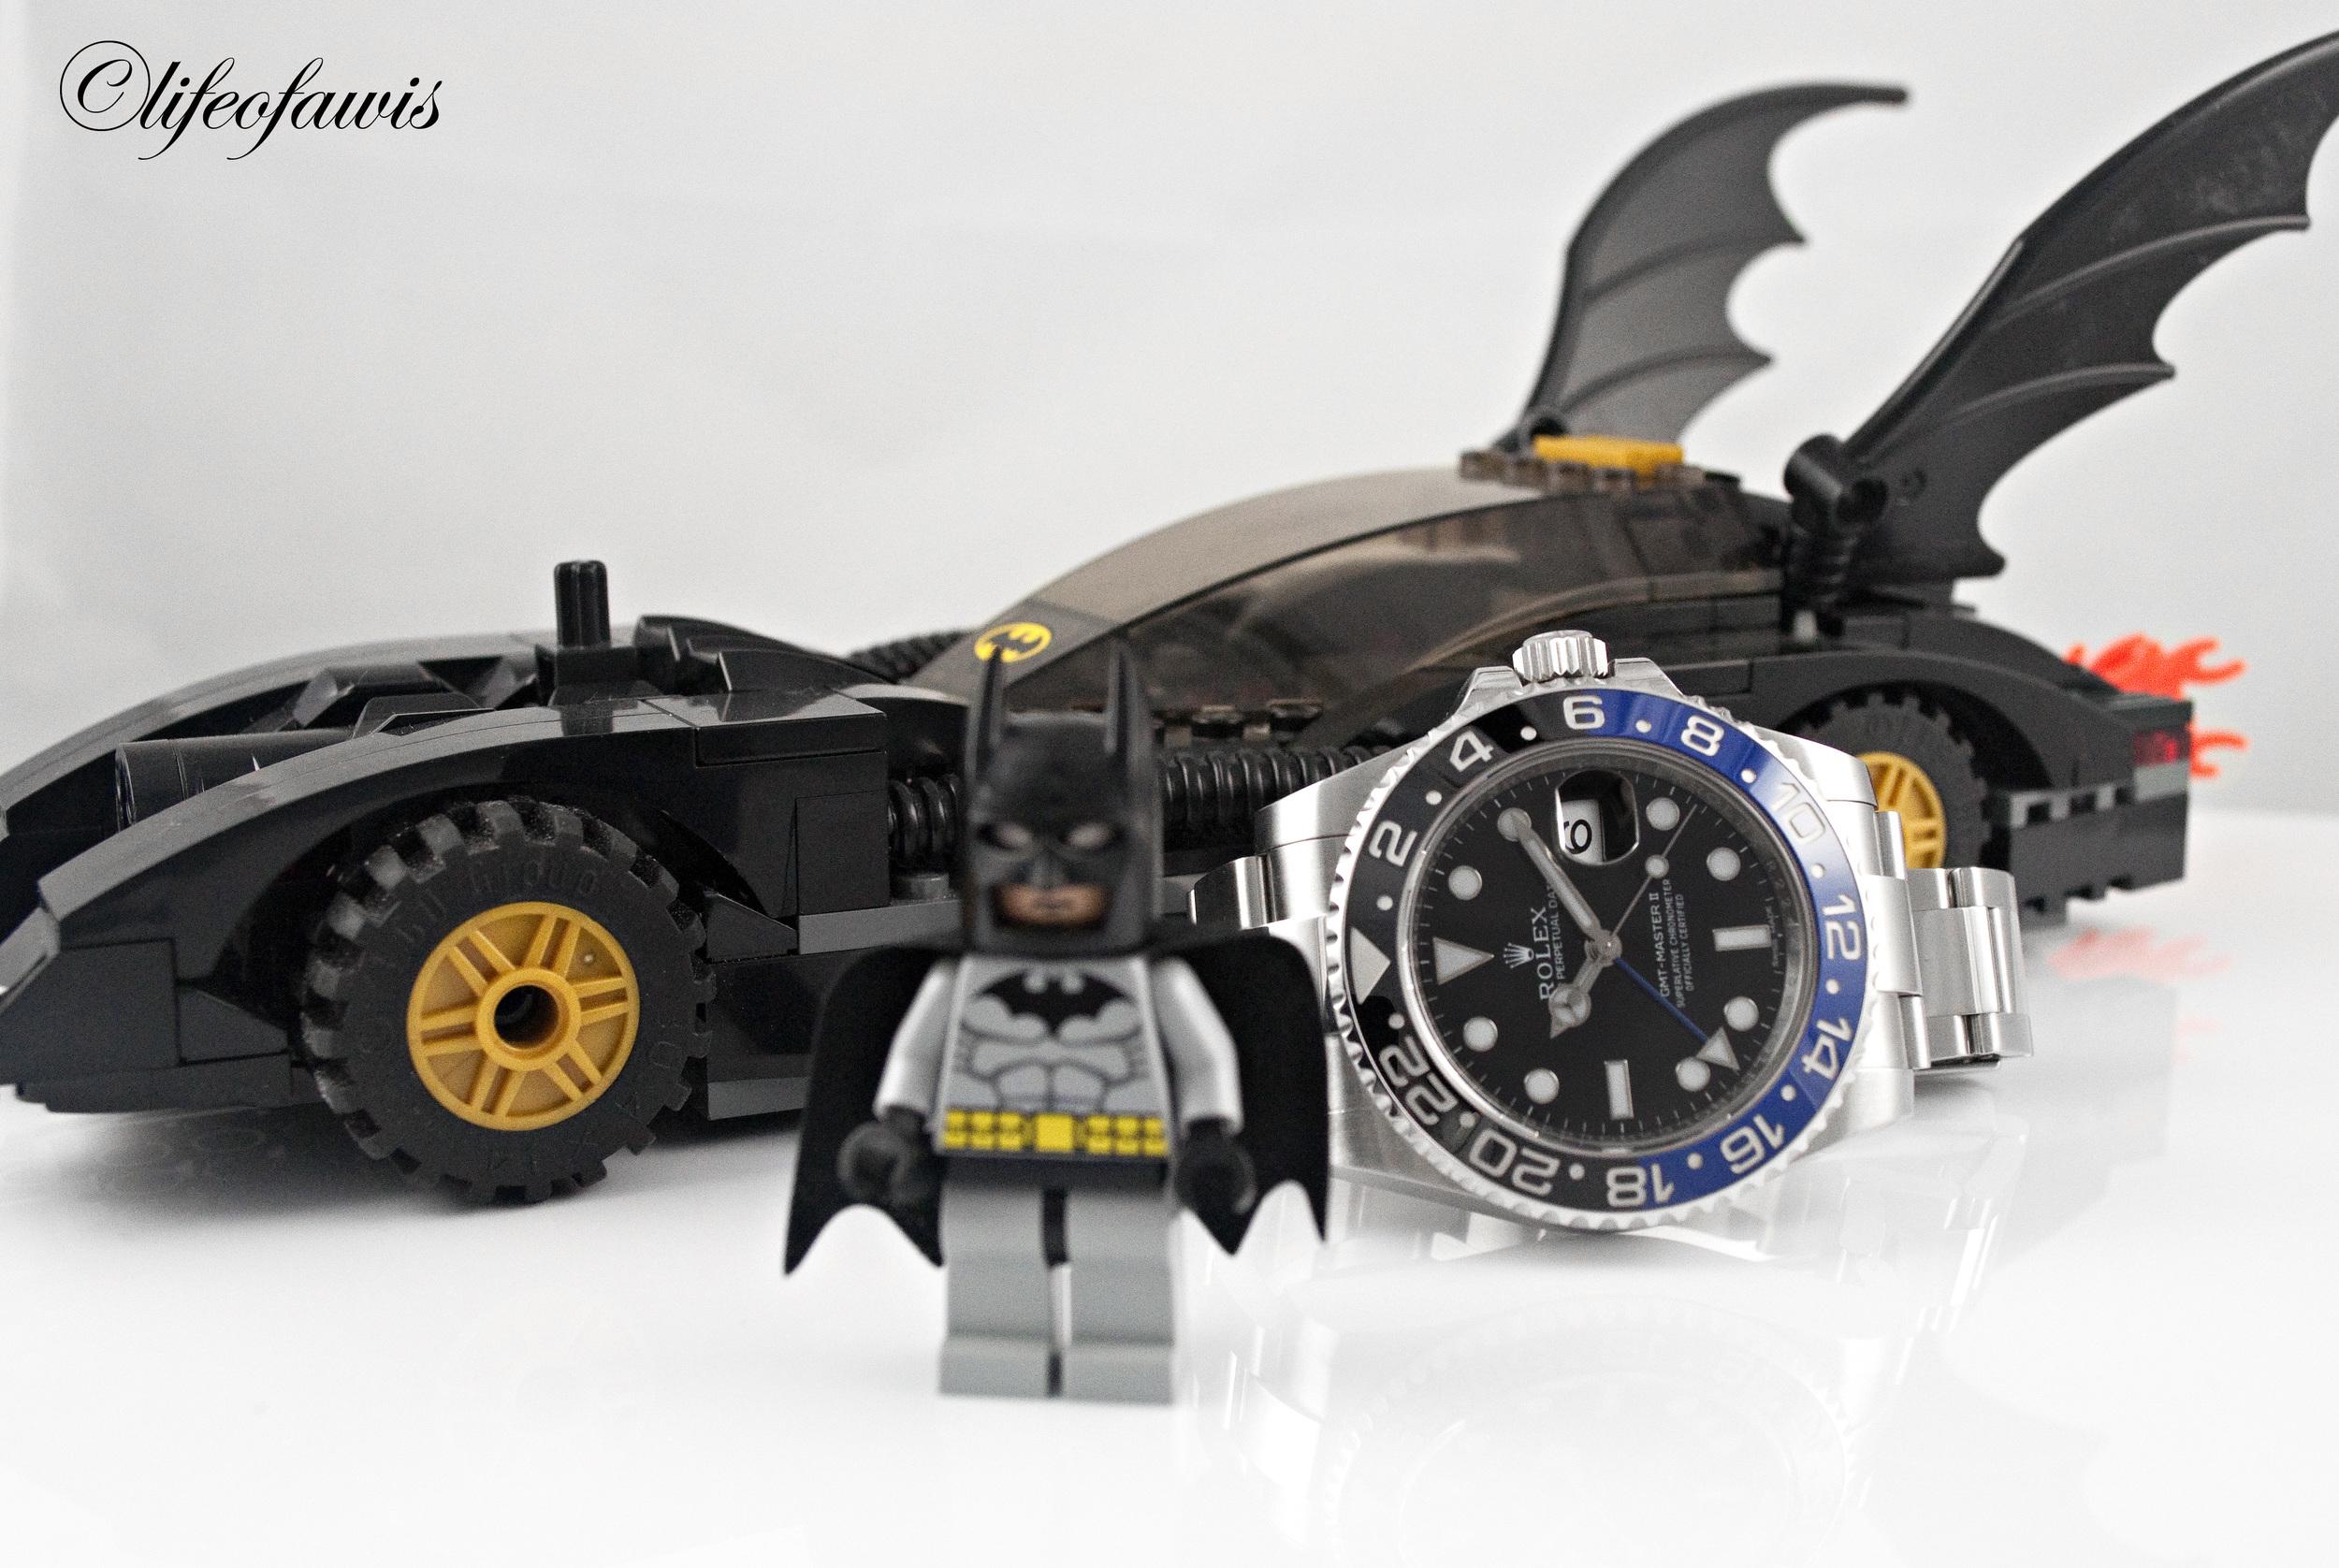 Batman has arrived.